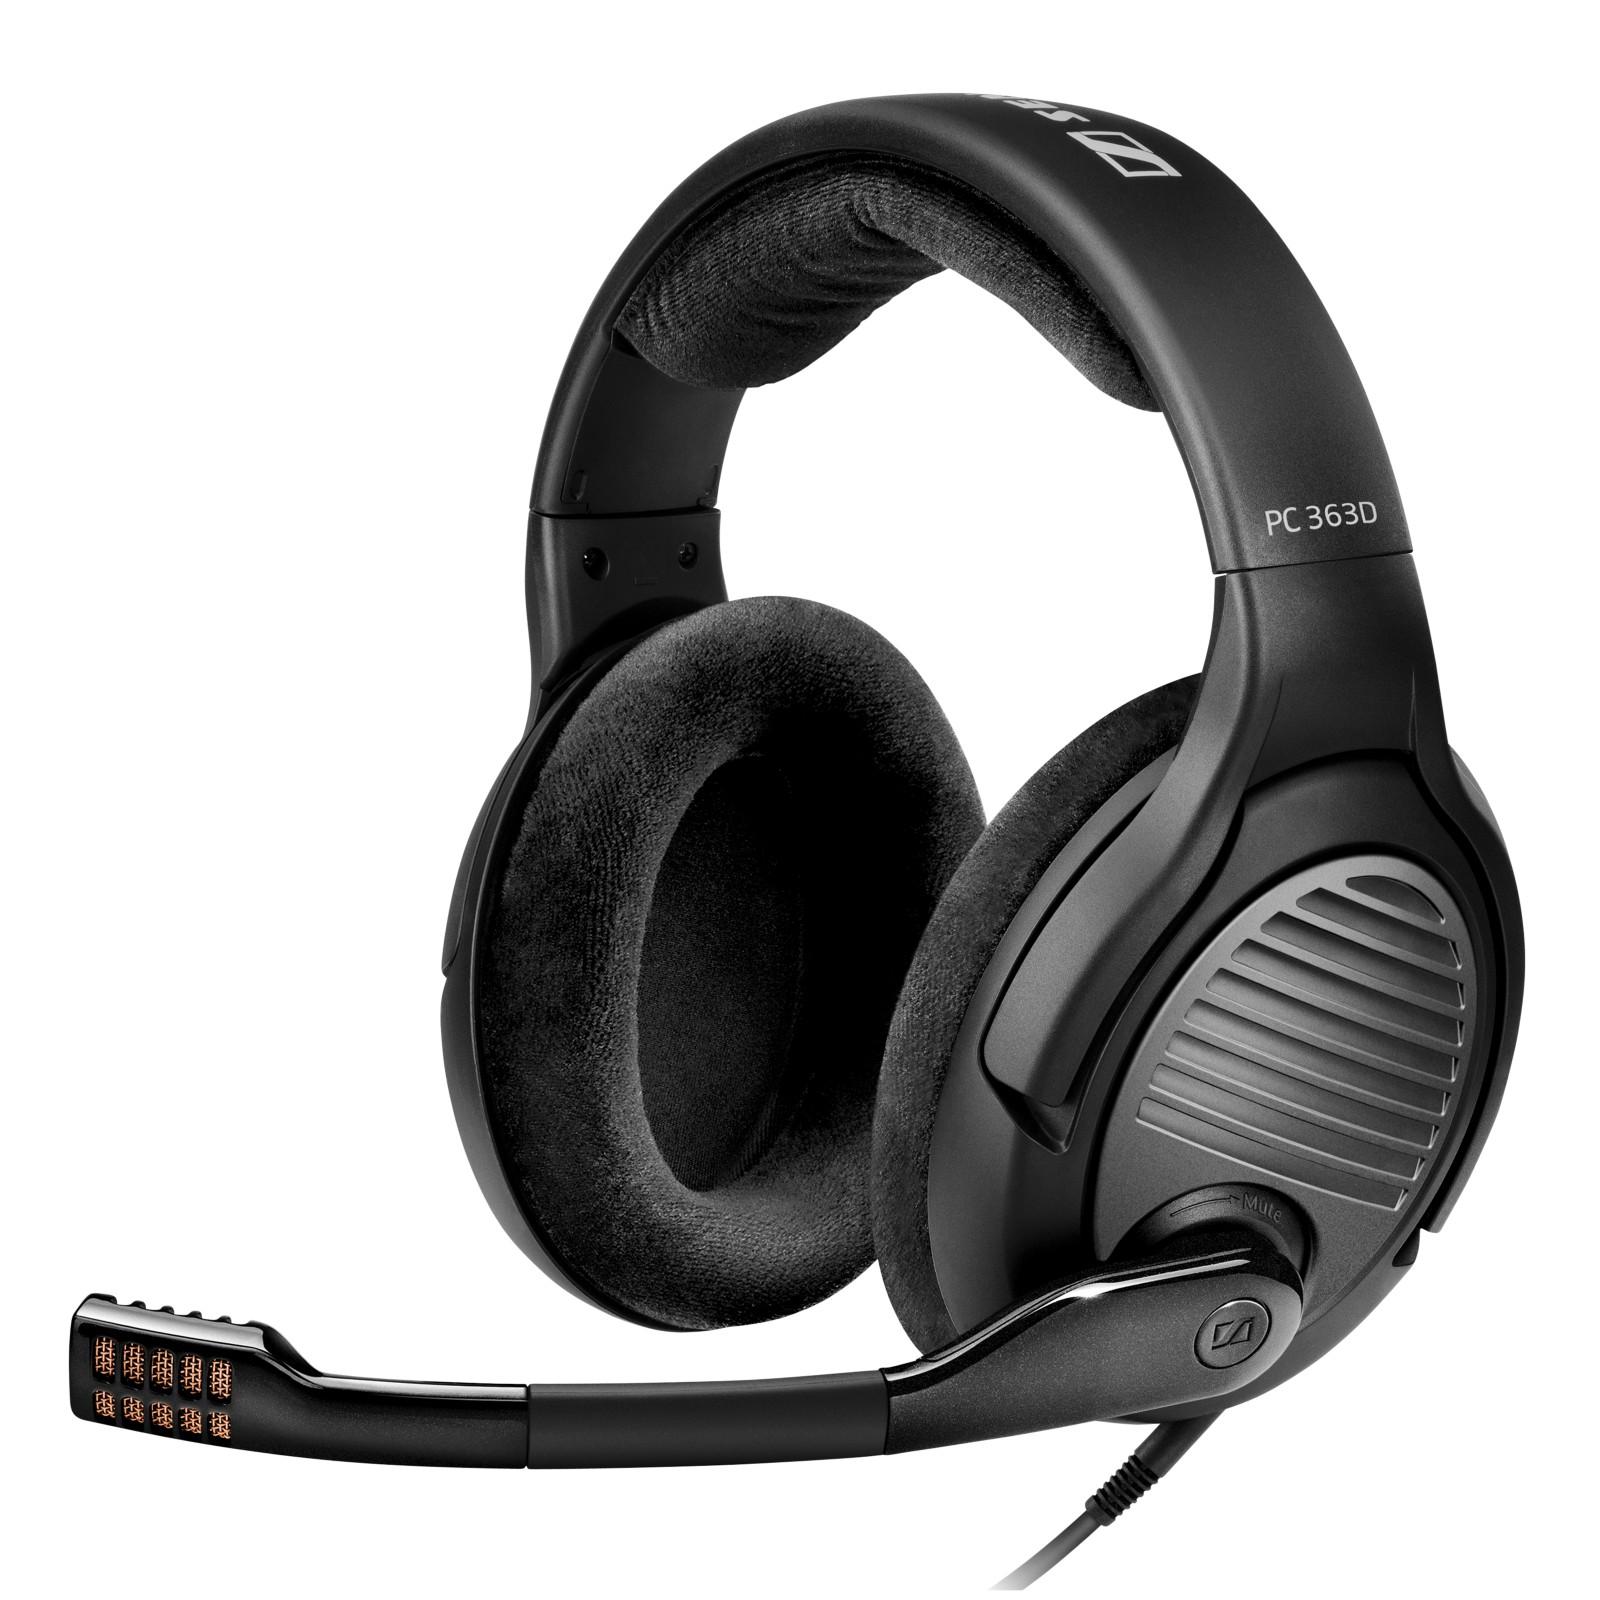 sennheiser pc 363d gaming headset review best buy review. Black Bedroom Furniture Sets. Home Design Ideas